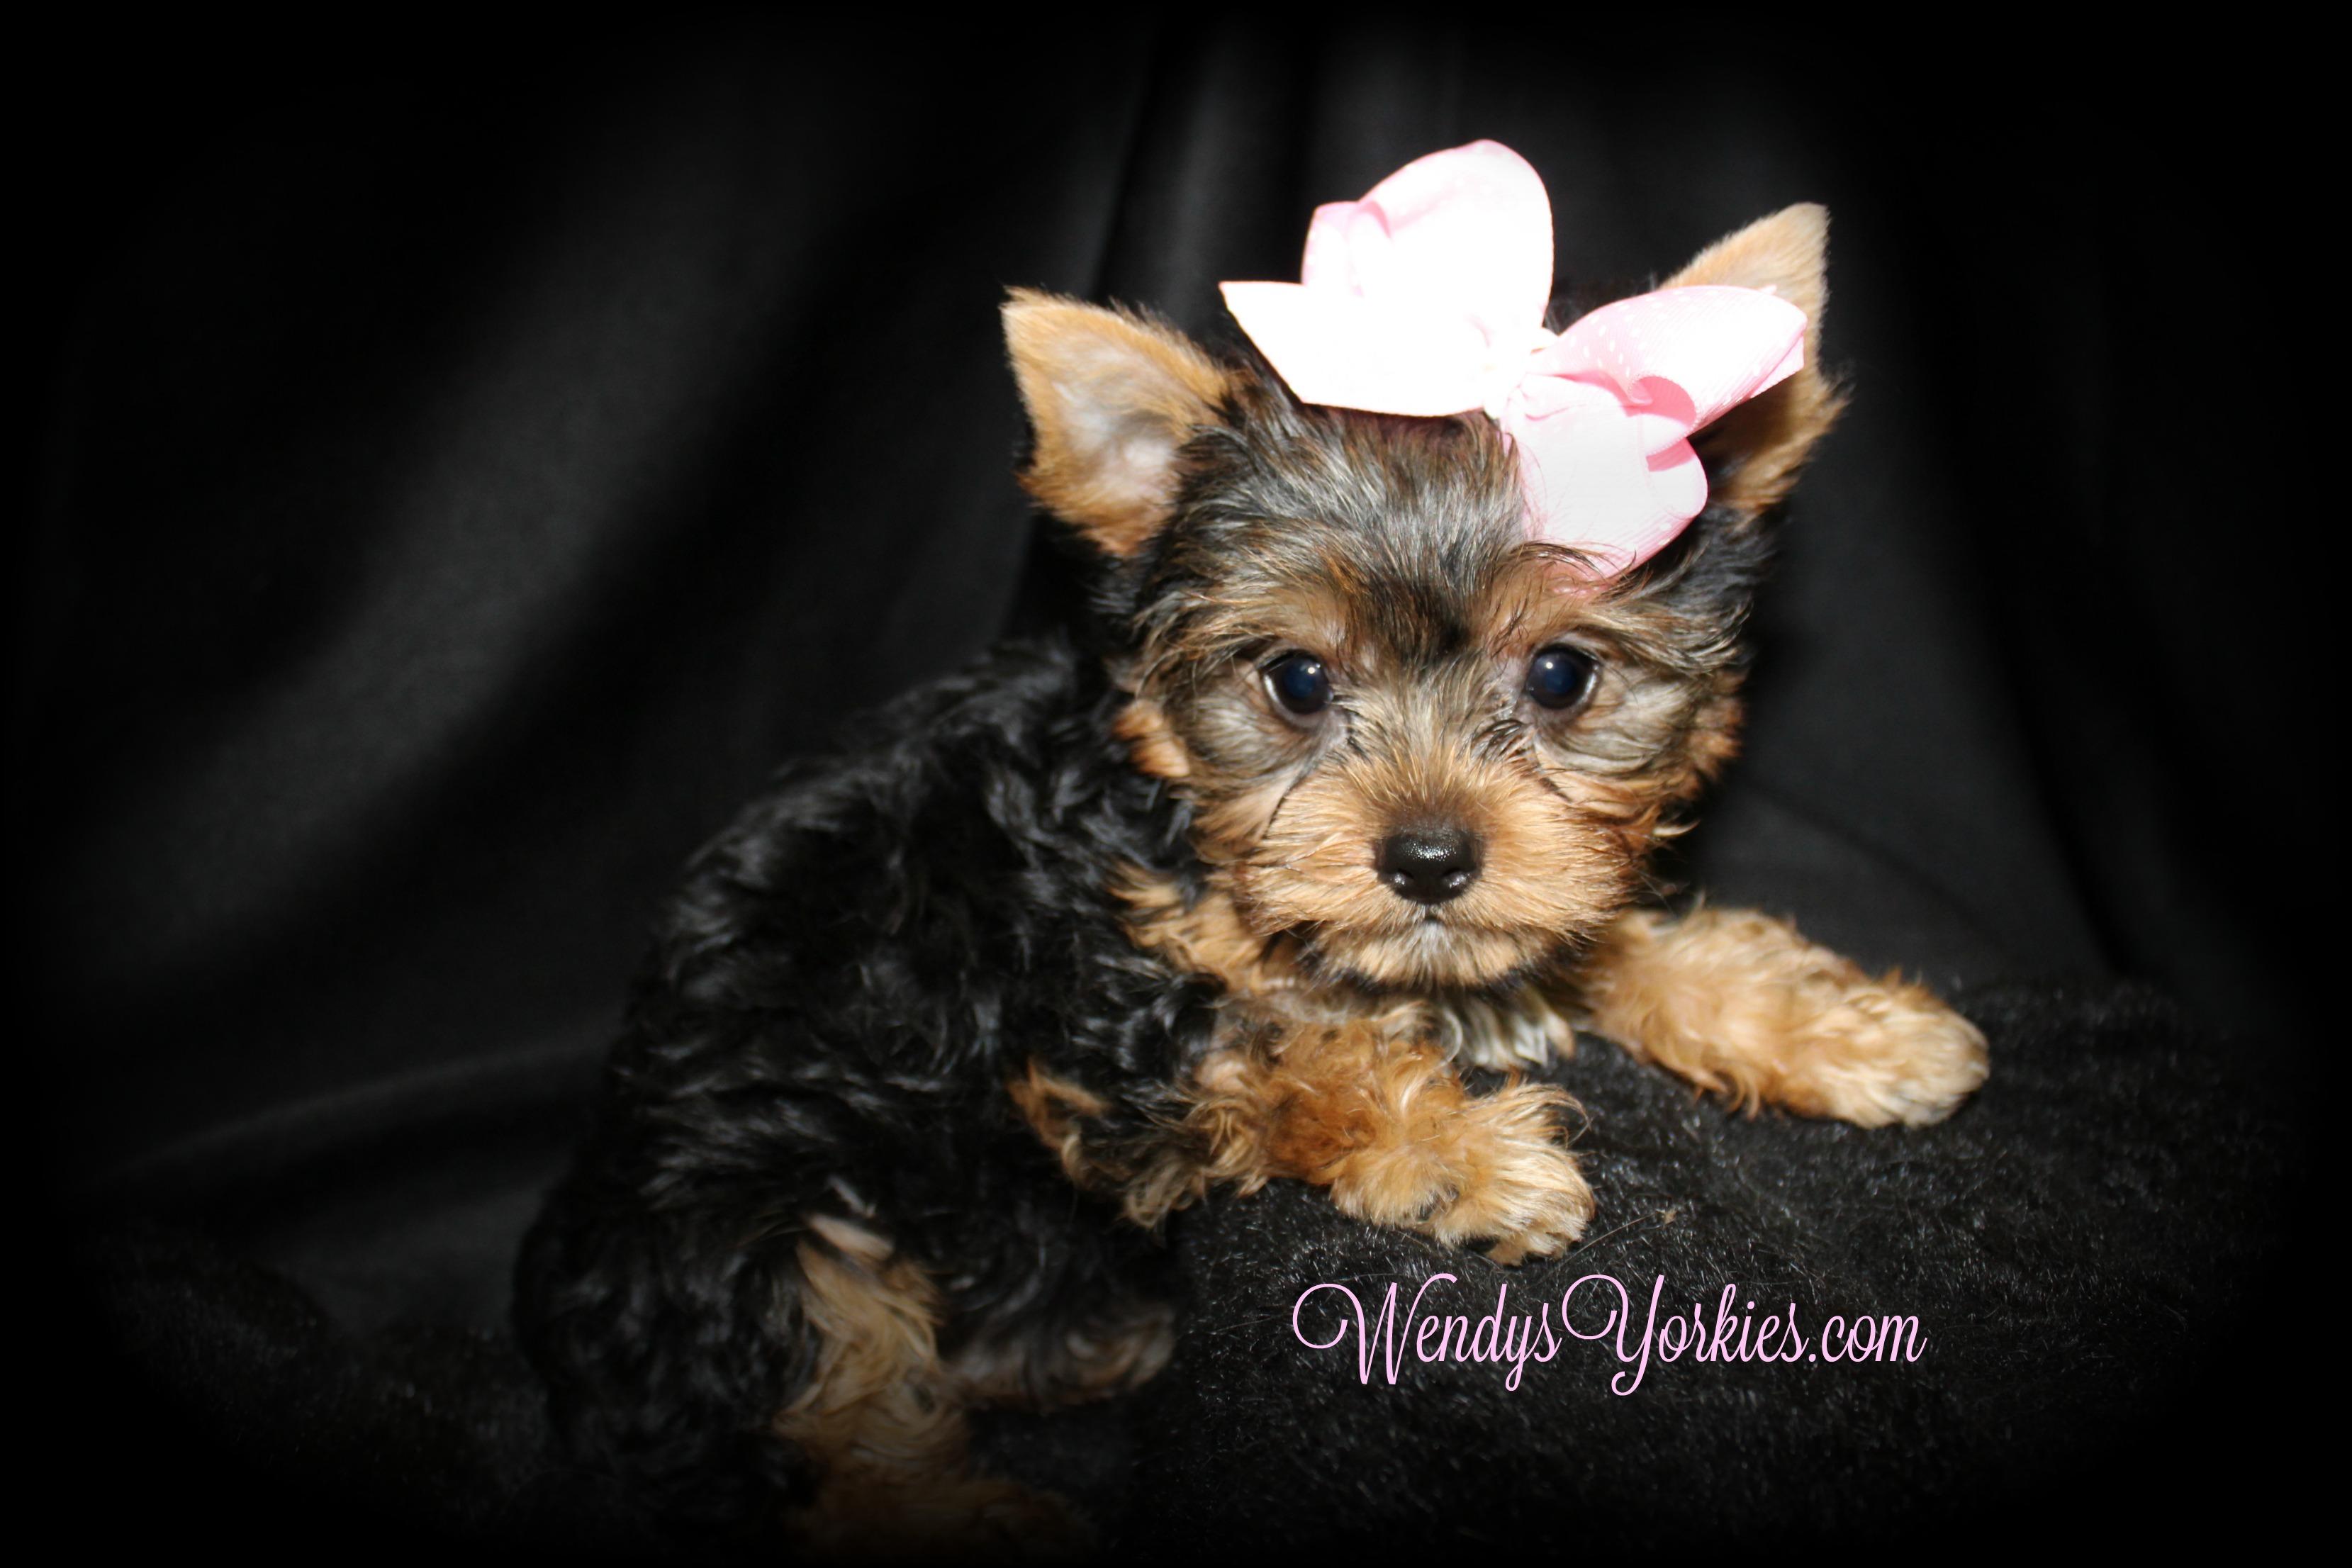 Yorkie puppies for sale in Texas, WendysYorkies.com, Gracie